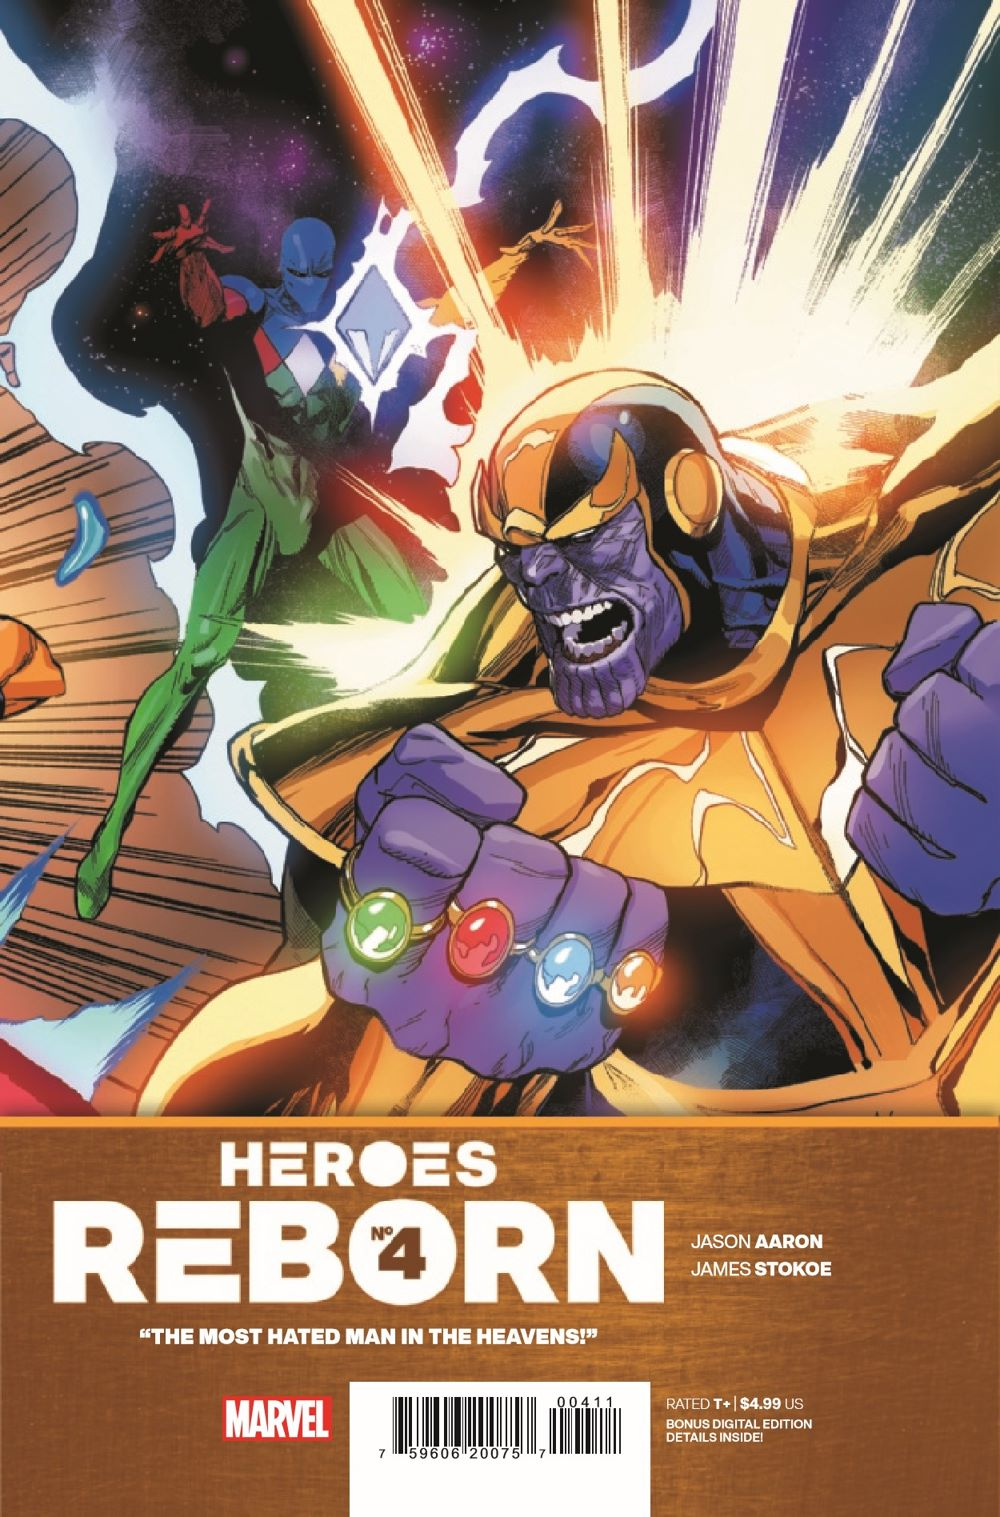 HEROESREBORN2021004_Preview-1 ComicList Previews: HEROES REBORN #4 (OF 7)